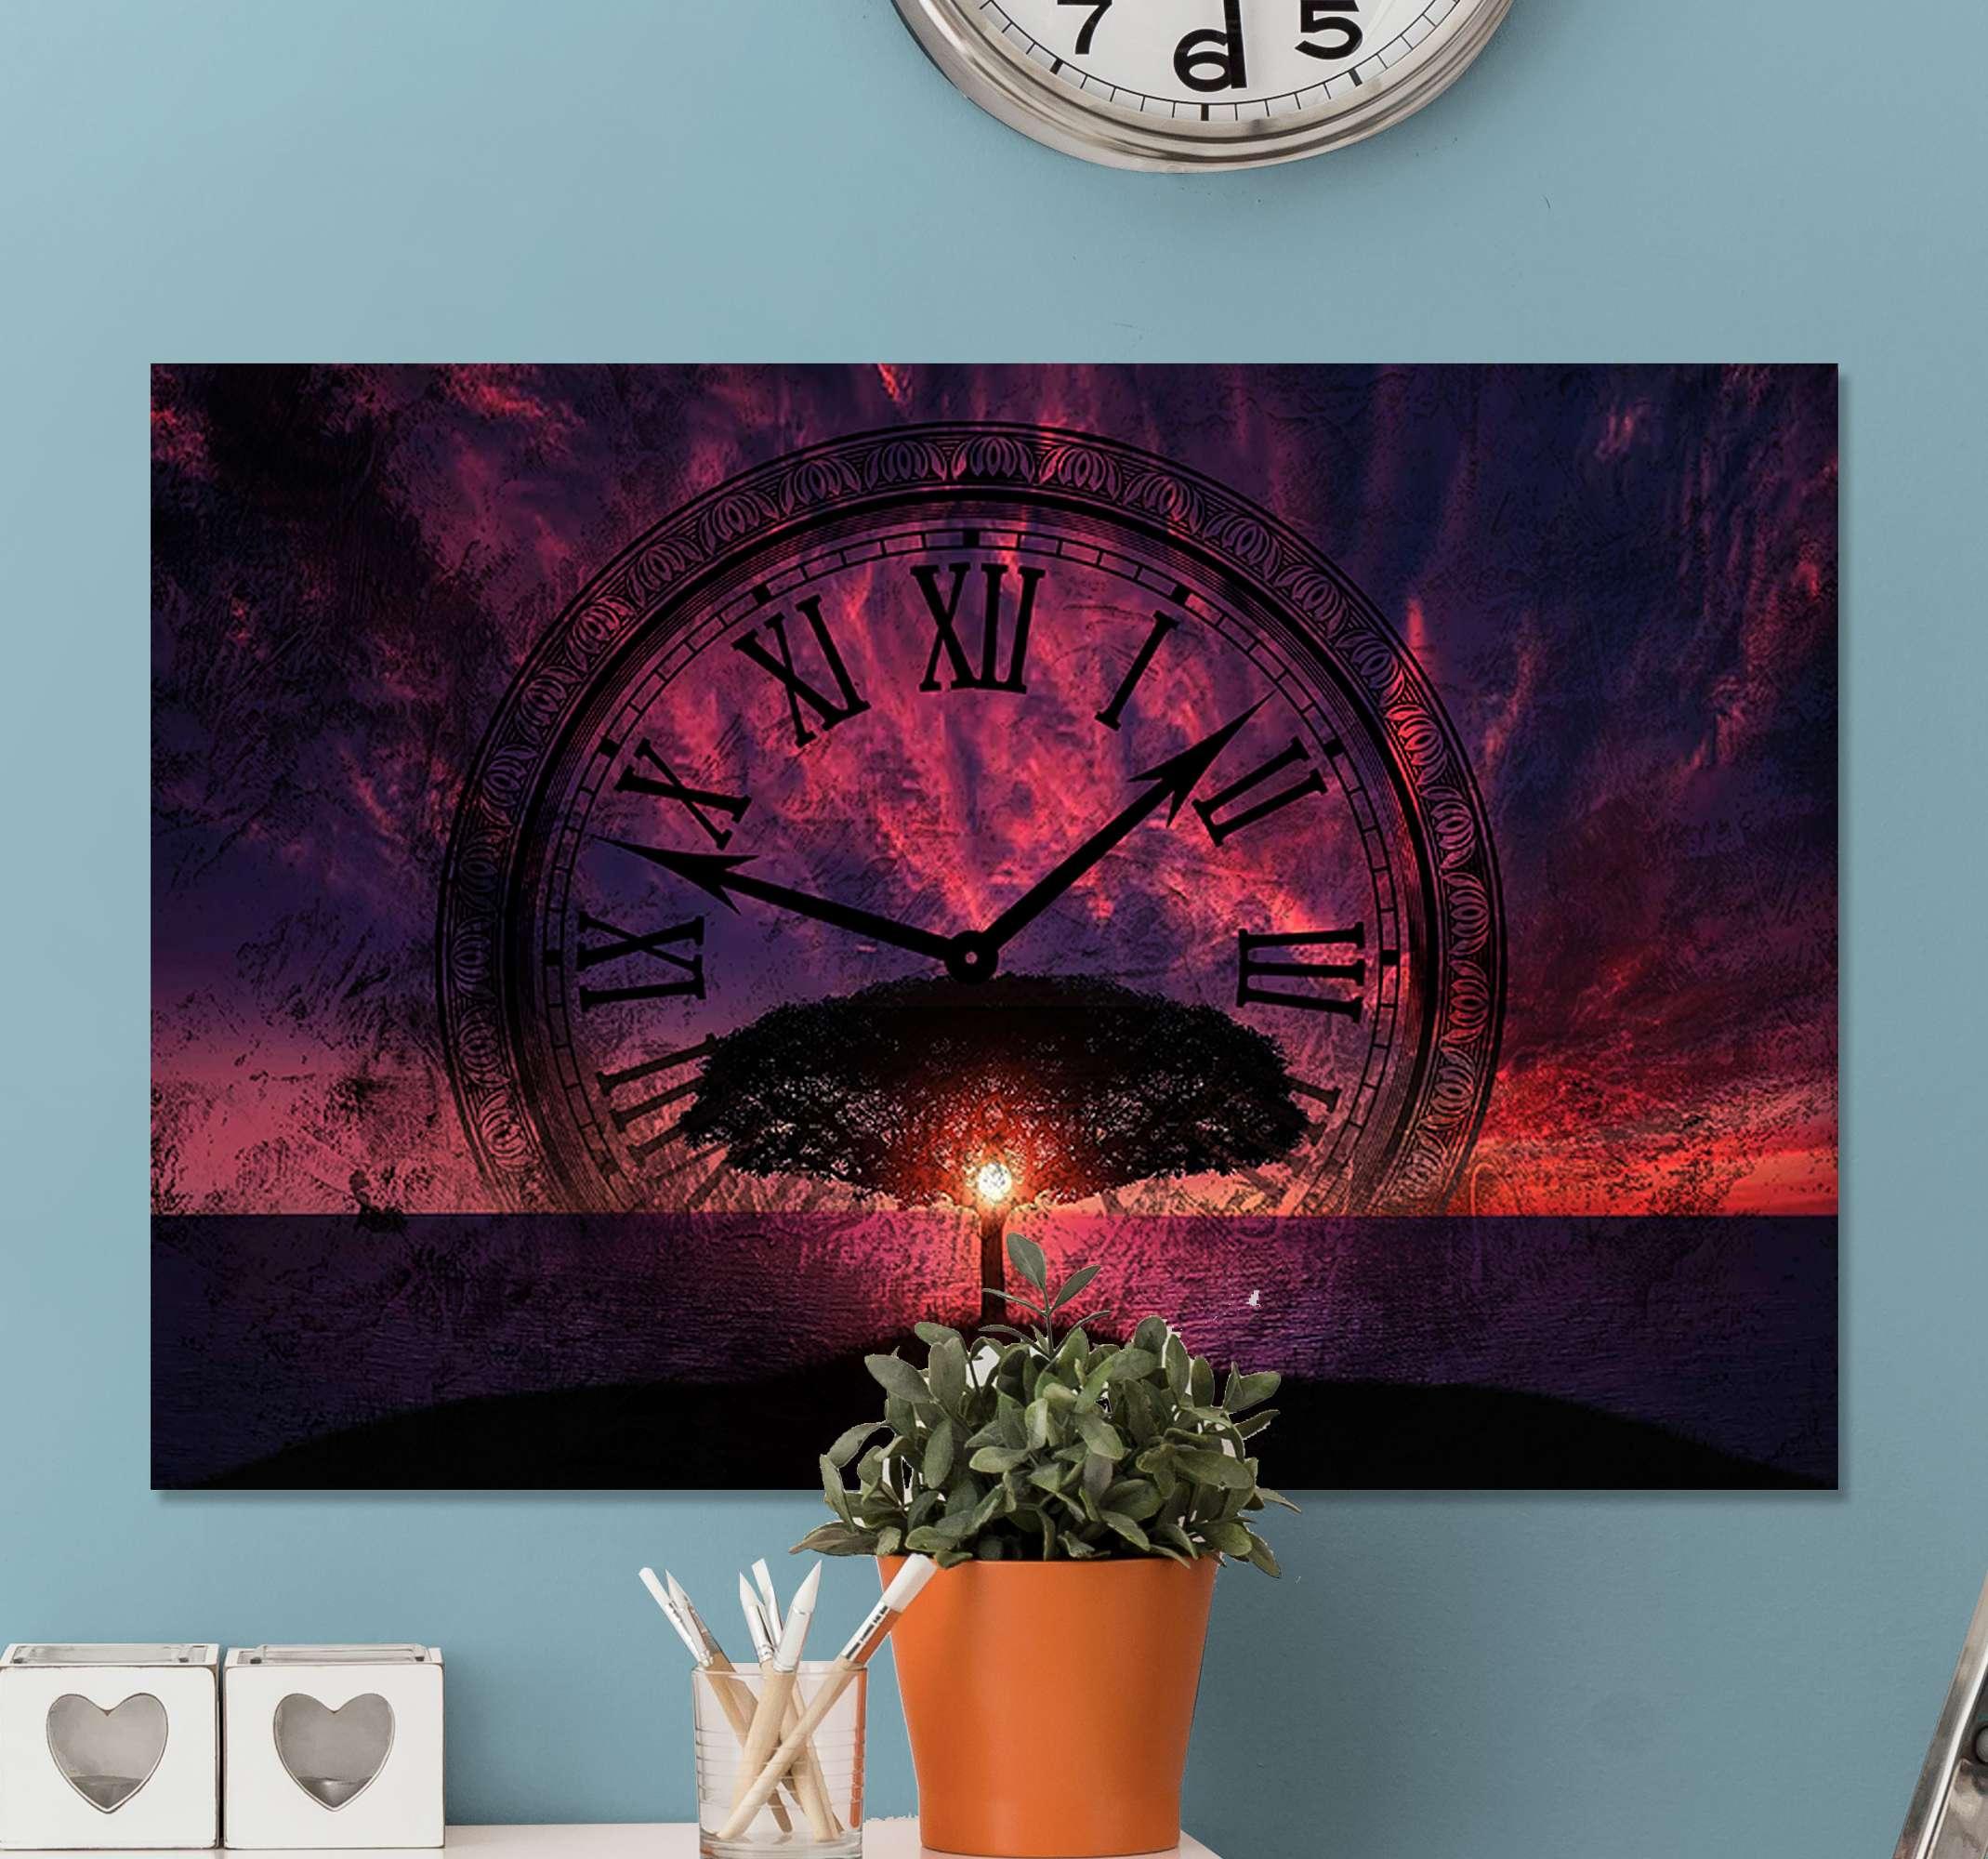 TenStickers. 不可避免的时间流转画布艺术. 美丽的画布艺术品打印与日落时的风景设计与一个大时钟。您可以用这种画布装饰任何空间。